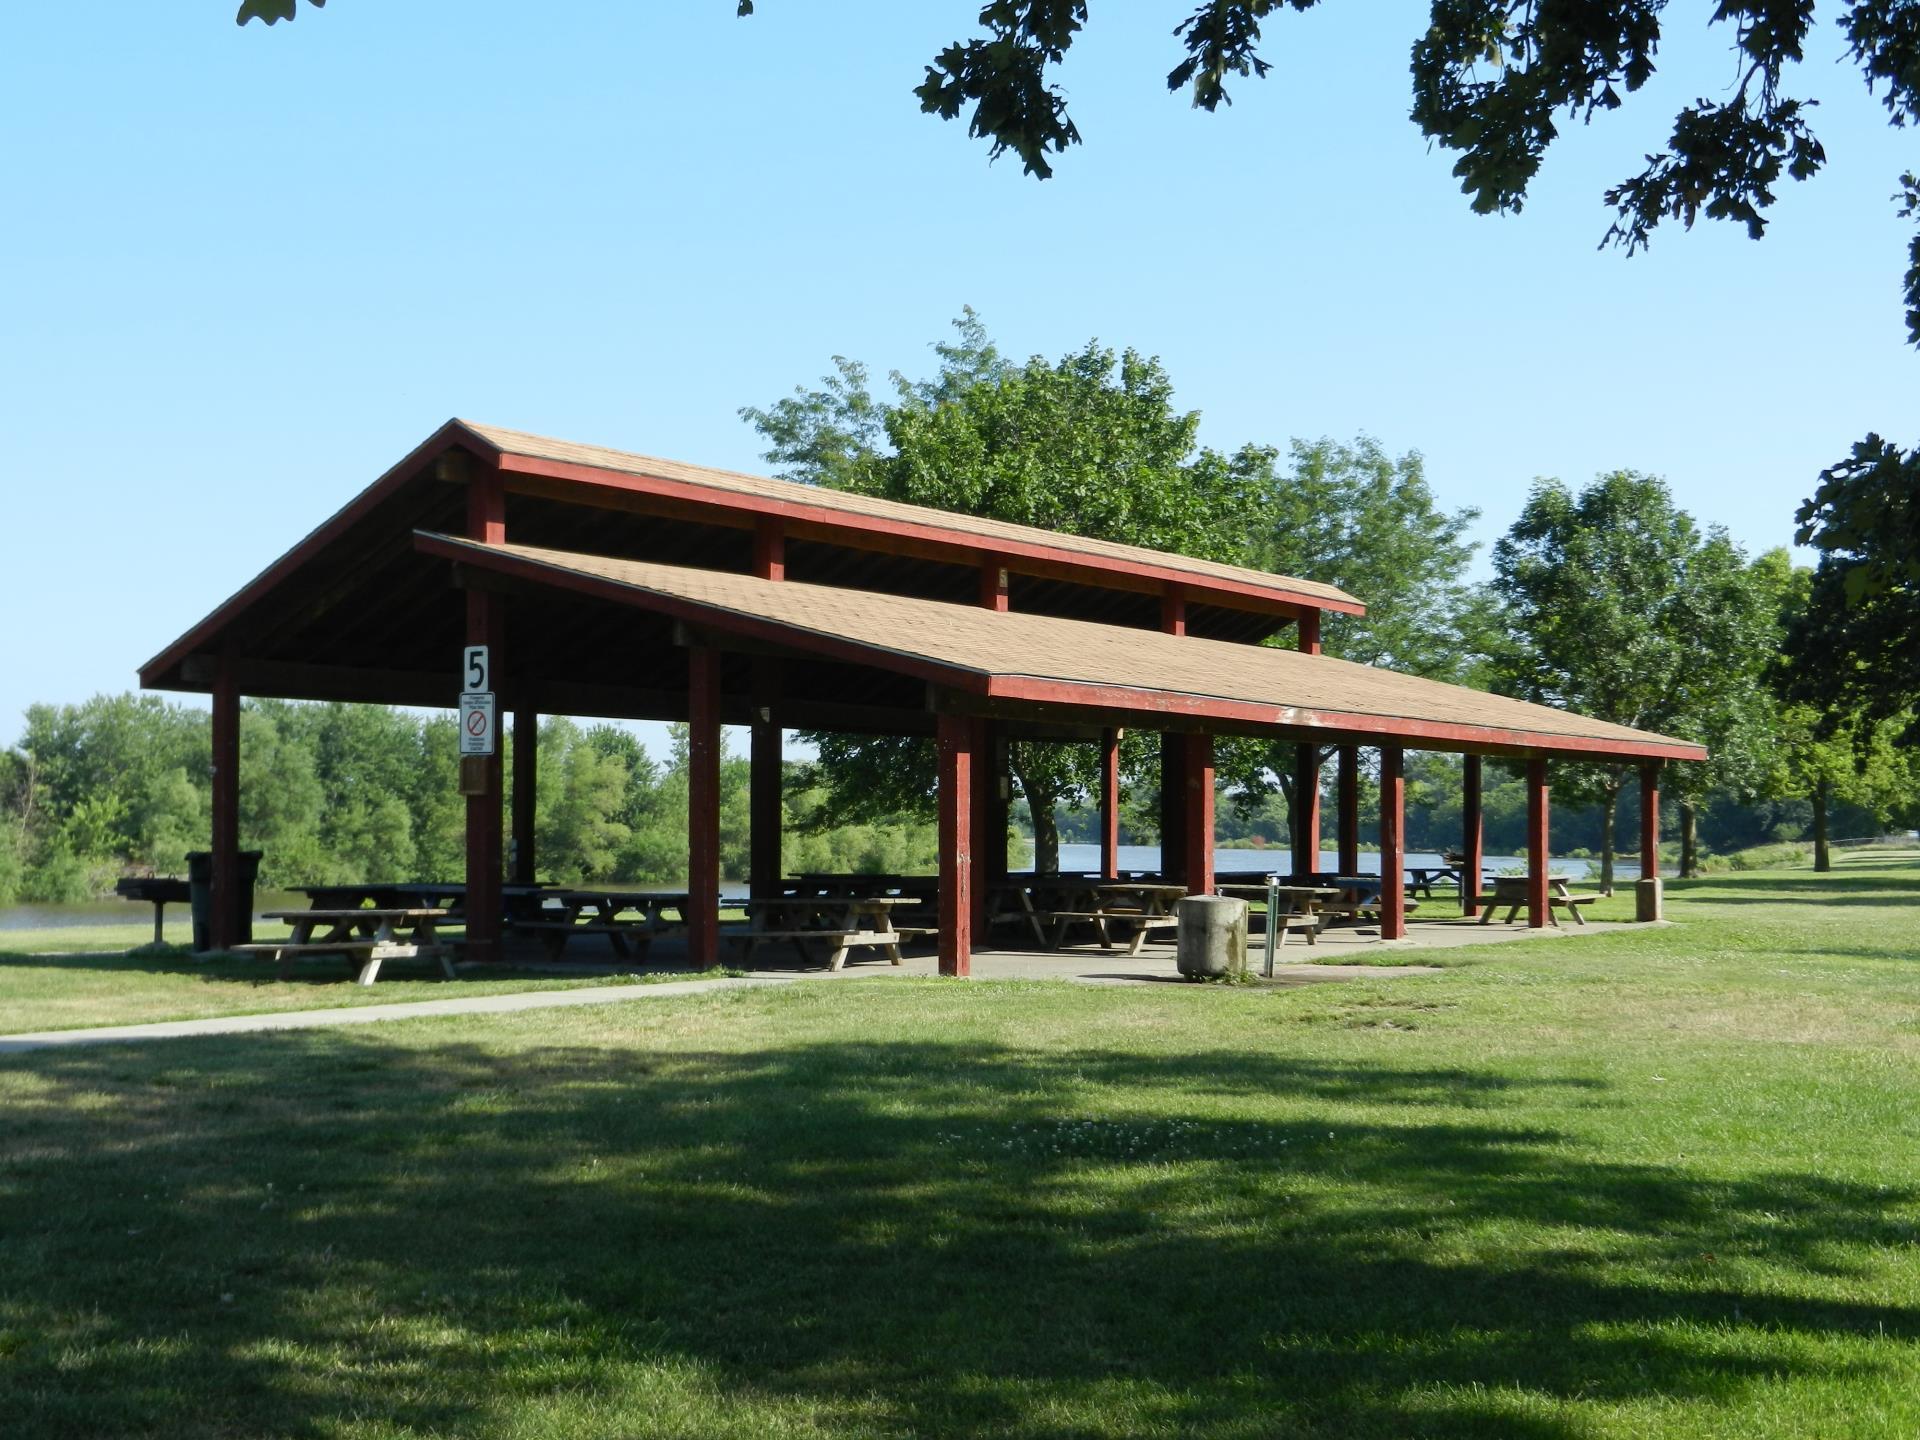 Riverside Park   Parks & Amenities   City of Sioux City website